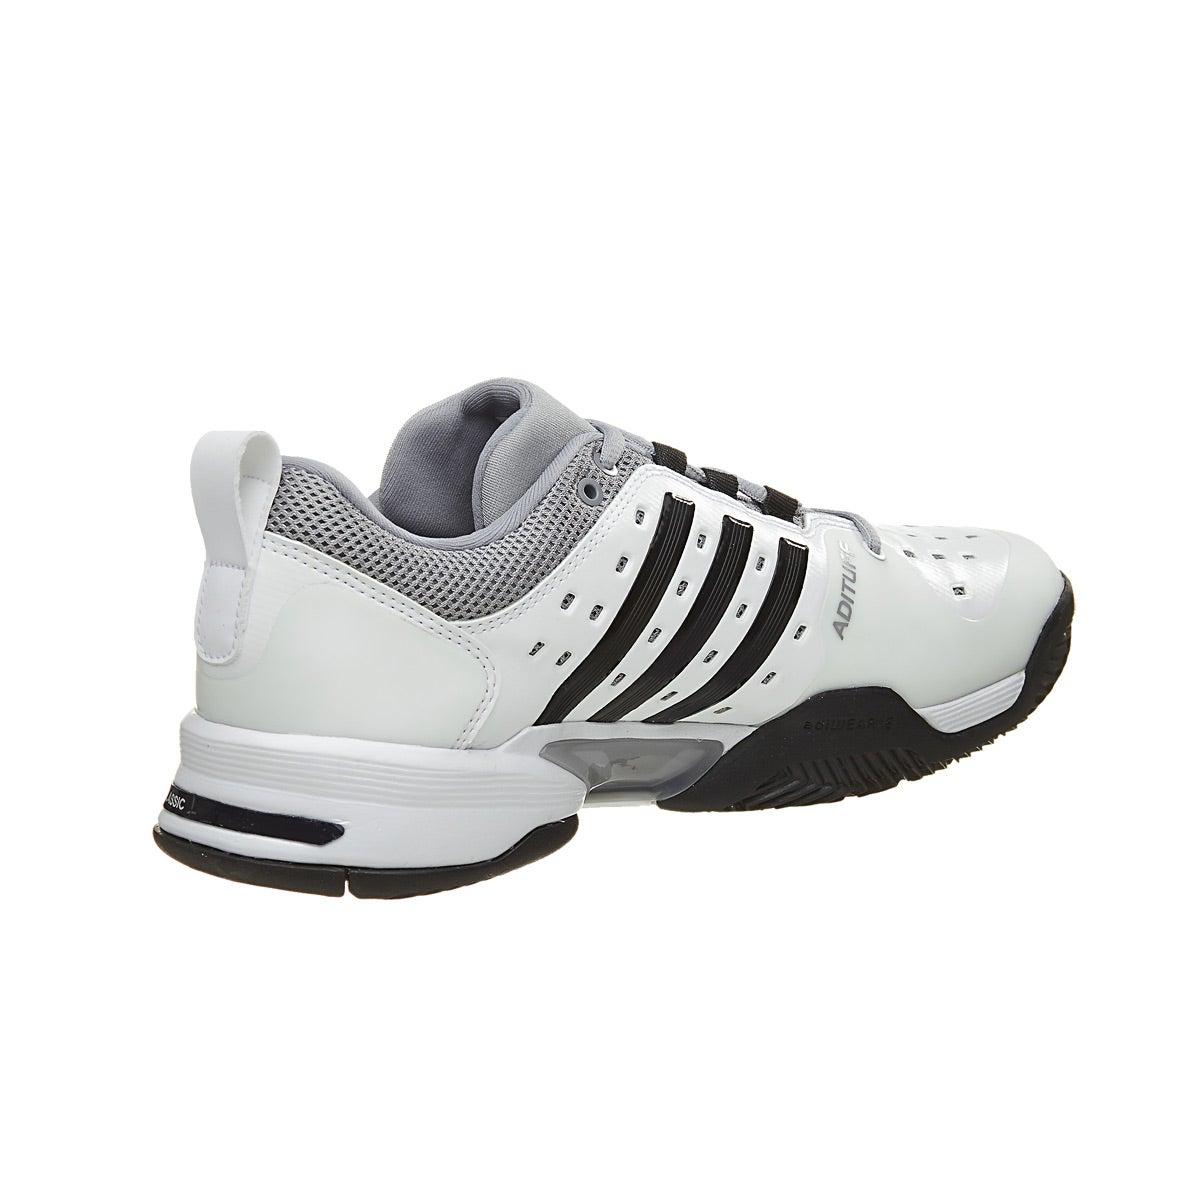 Adidas 4e Tennis Barricade Wide Classic CdexoB